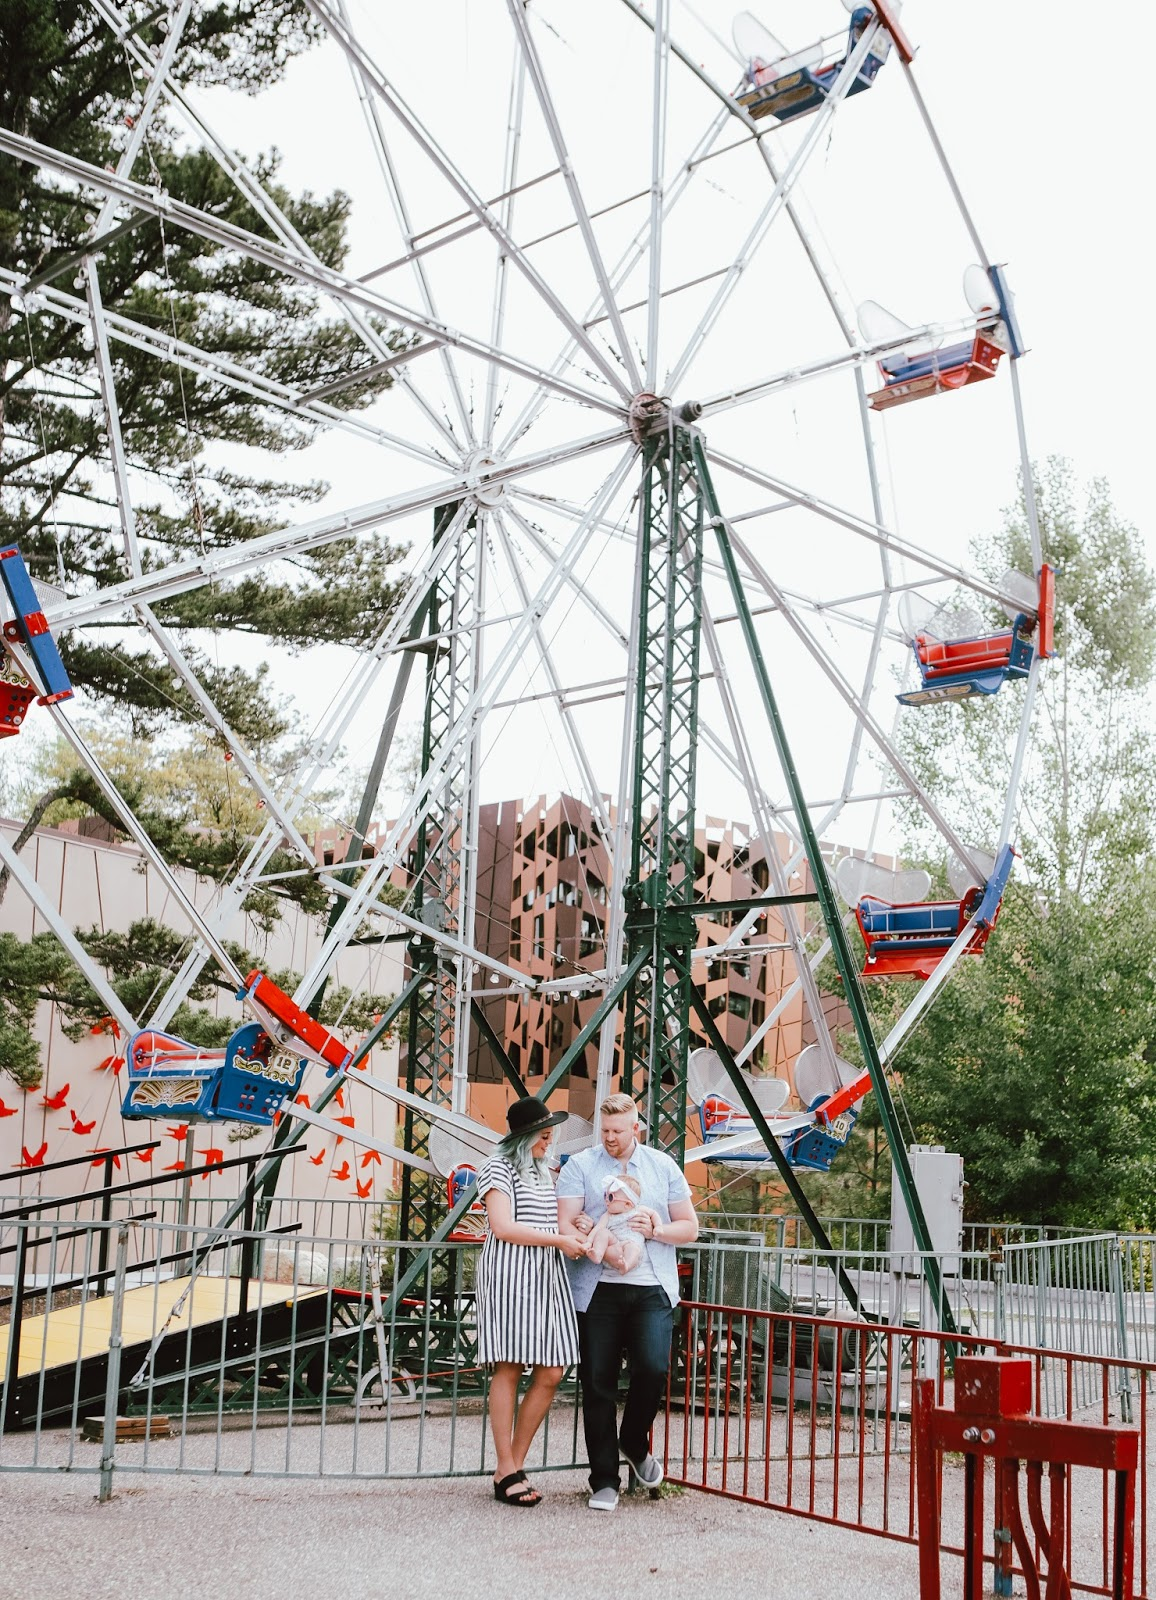 Ferris Wheel, Fathers Day Activities, Crocs